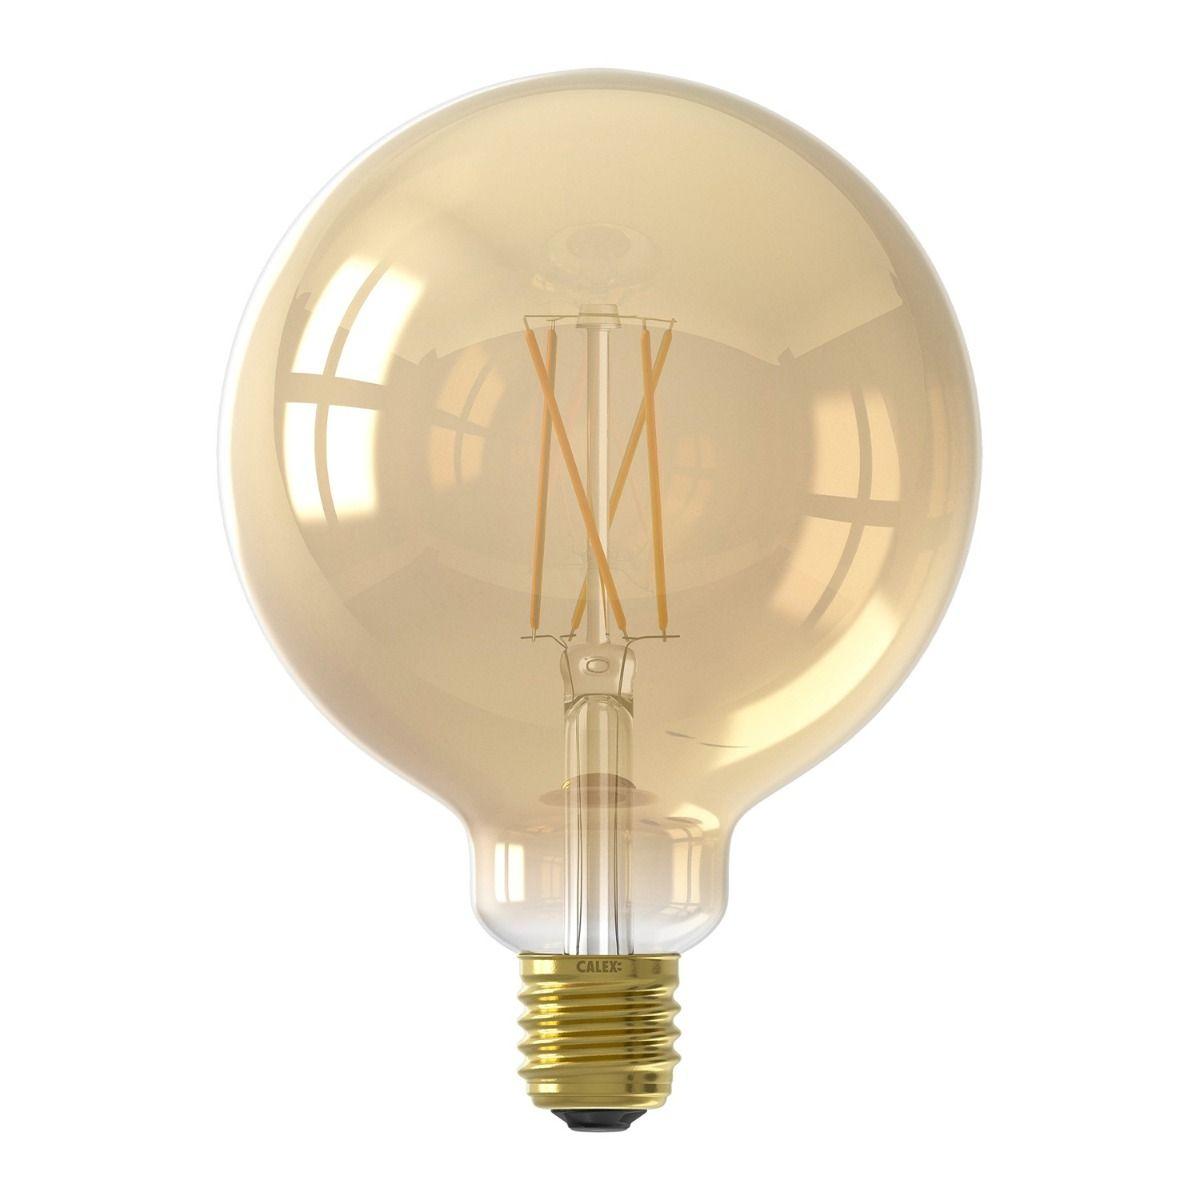 Calex Smart Globe G125 LED Glühbirne E27 7W 806lm 1800-3000K Fadenlampe | Tuya Wifi